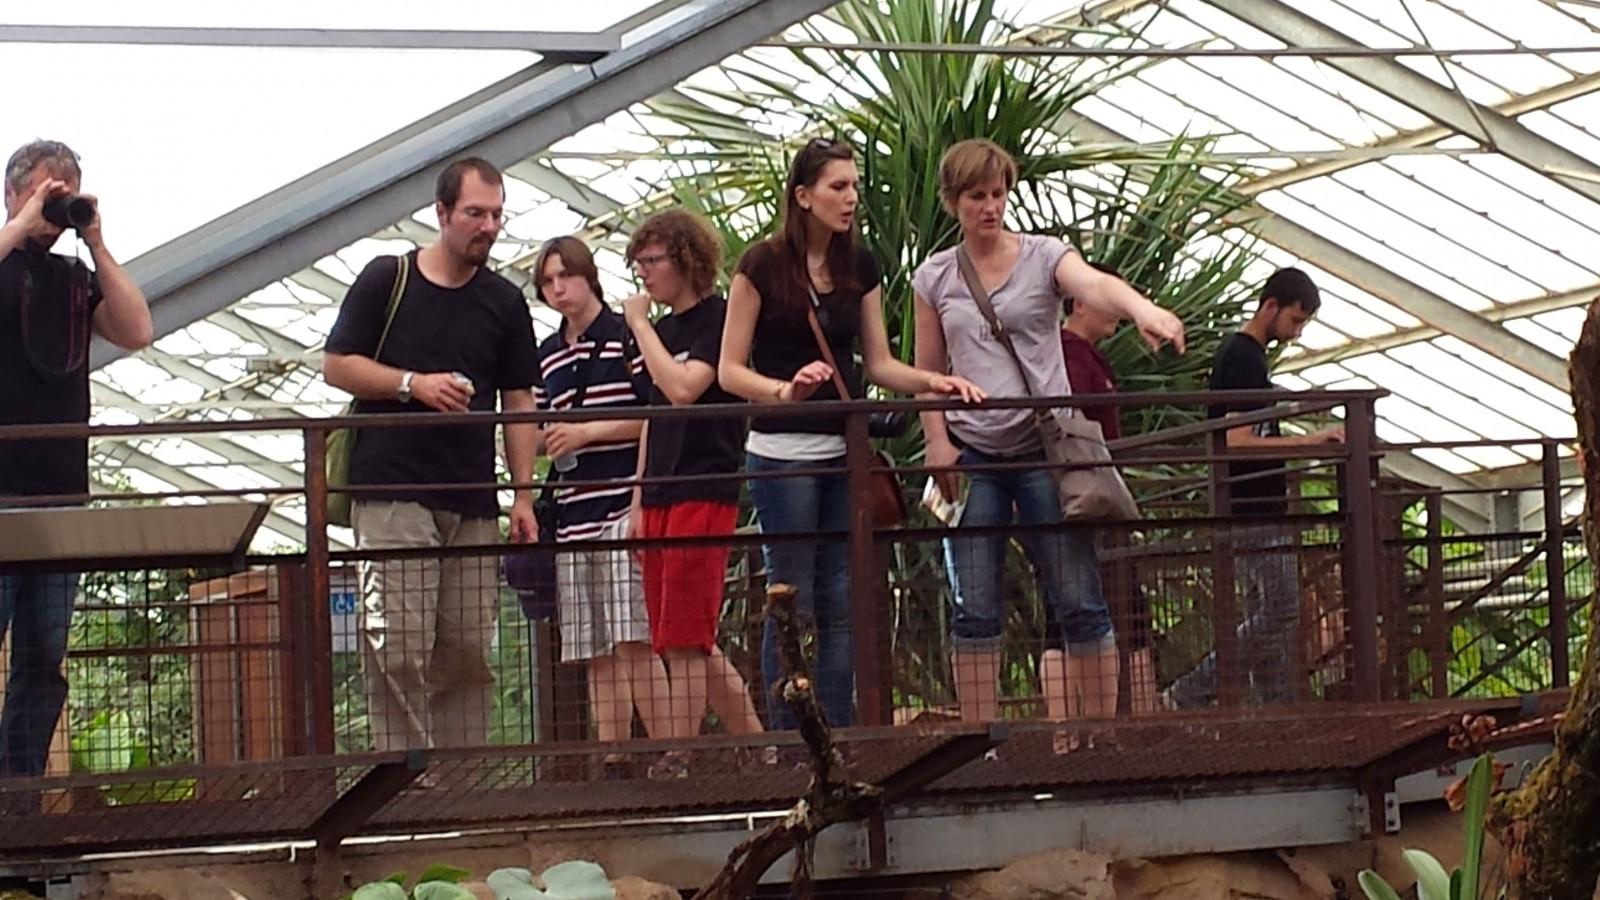 Ecole cheval paysage amiti franco allemande for Halloween 2015 jardin franco allemand